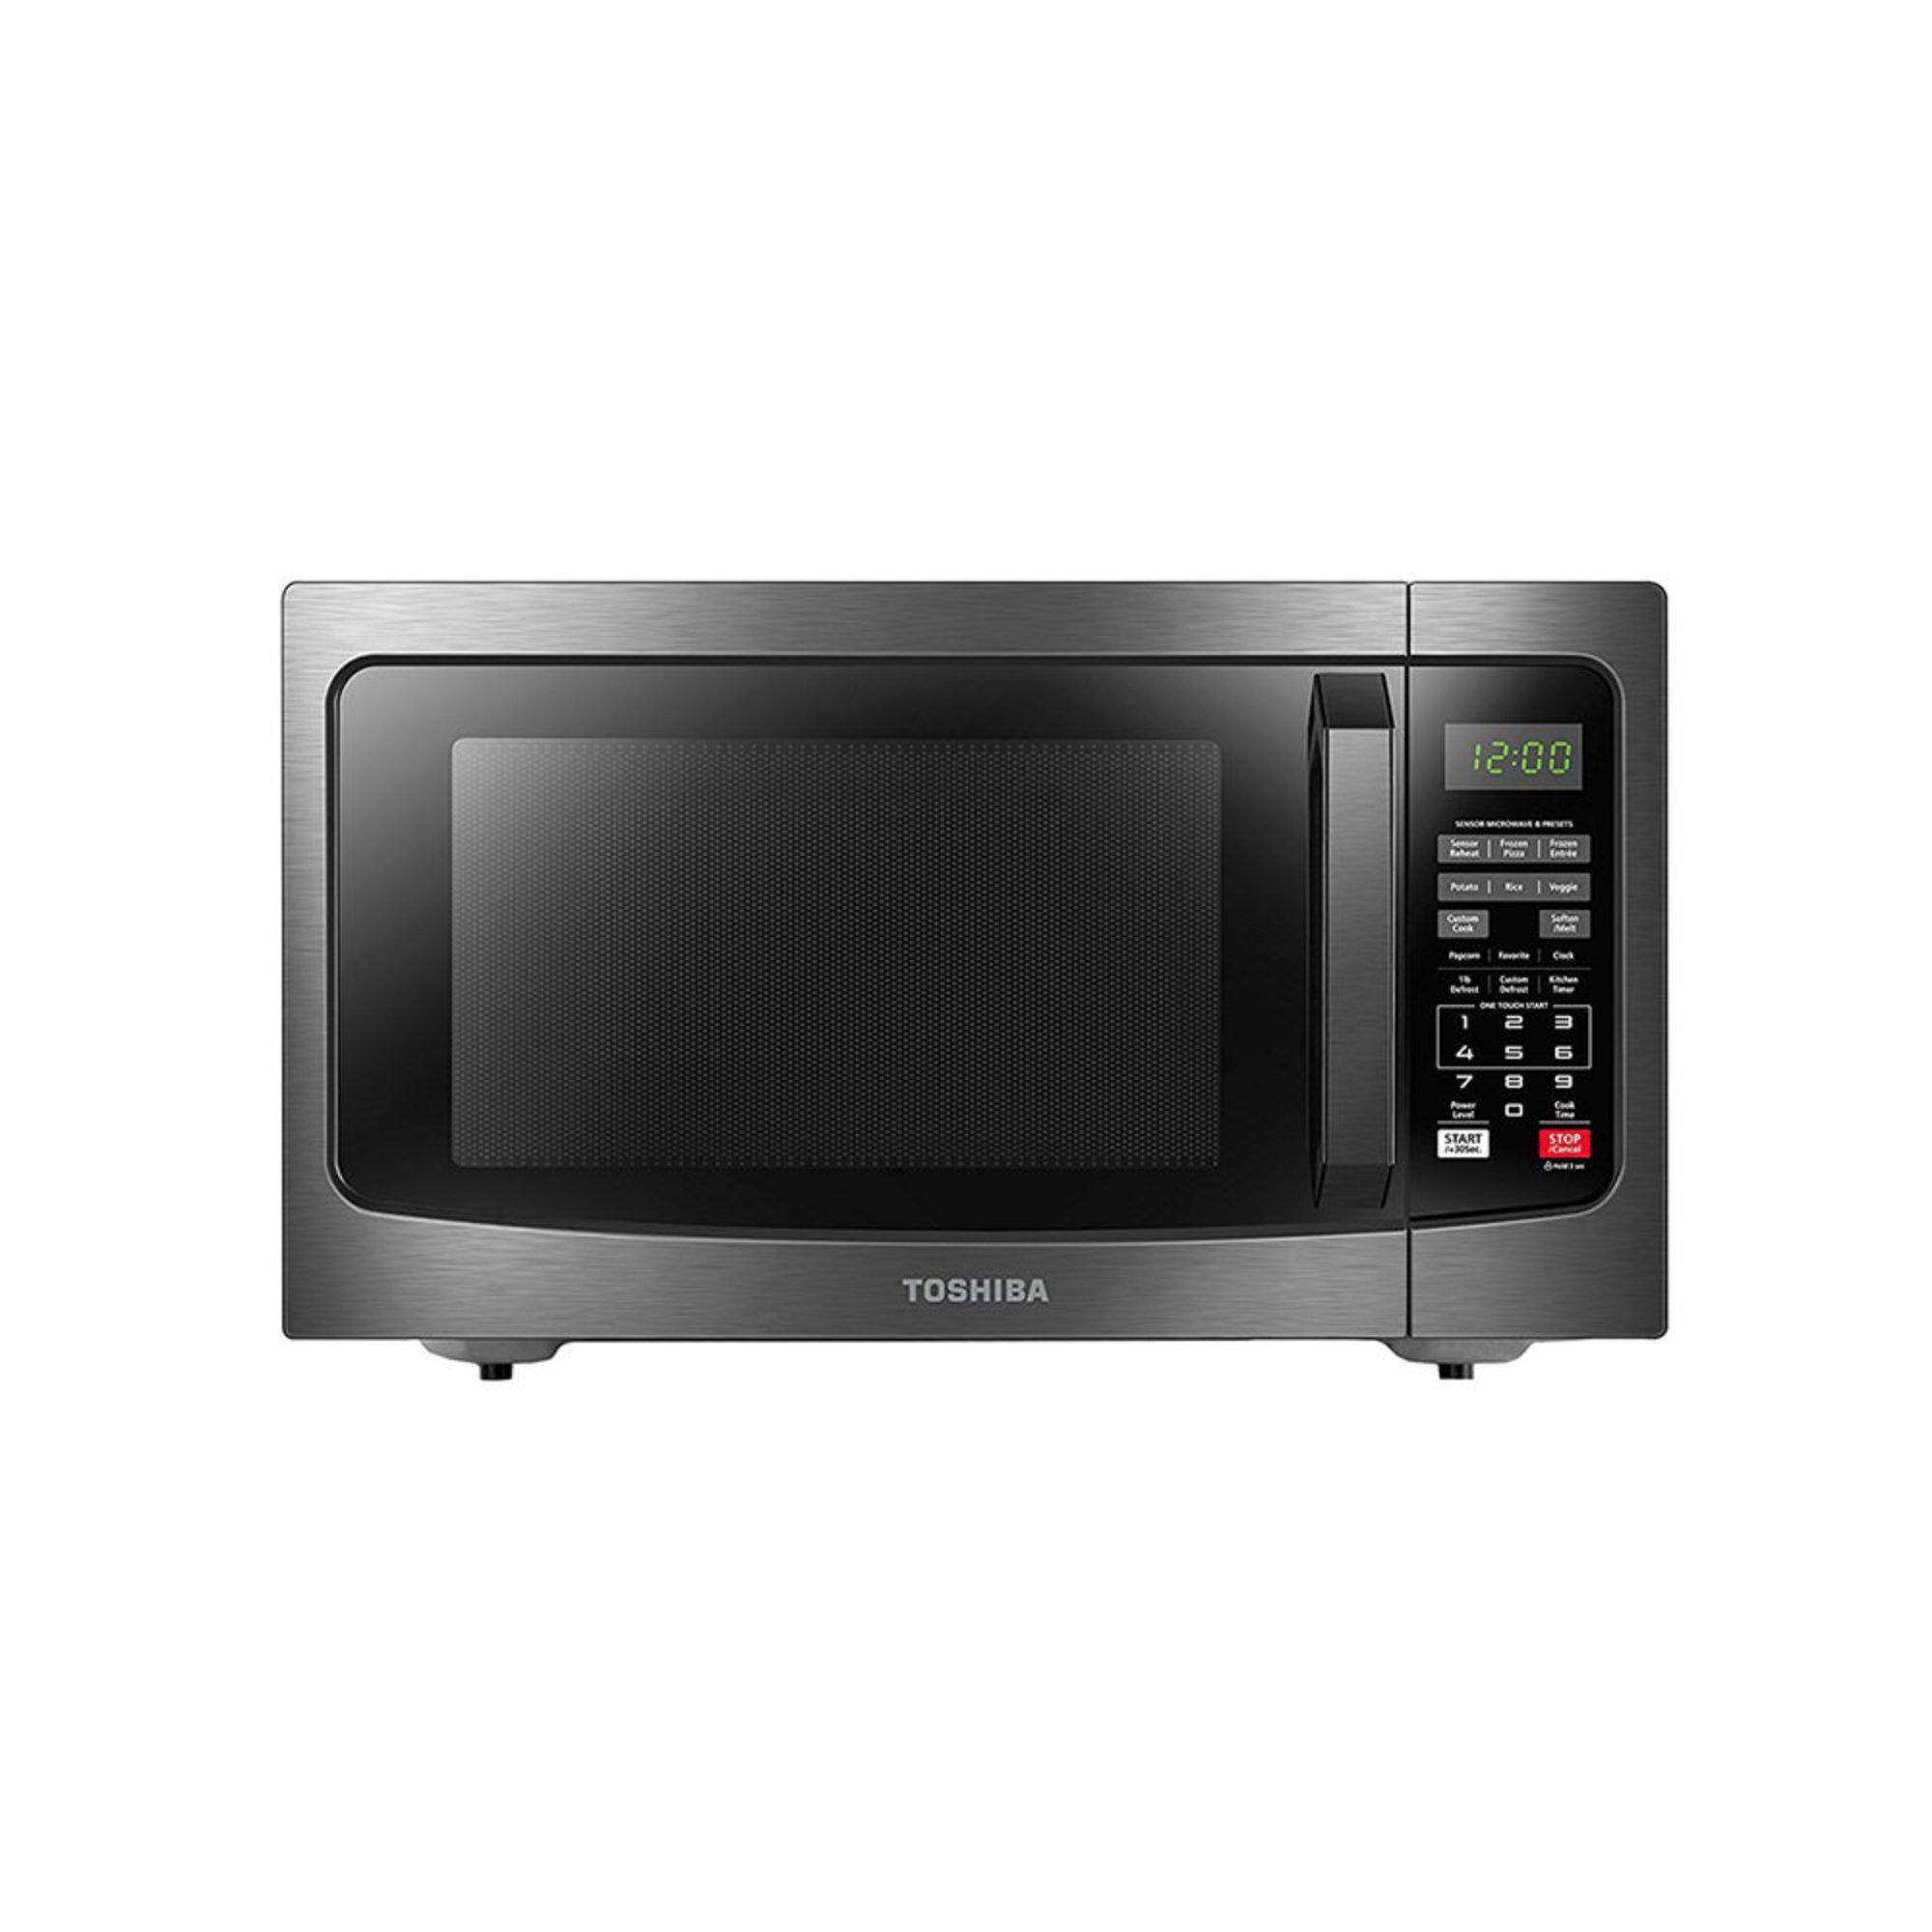 American Heritage Microwave Oven: Toshiba 1.2-cu.ft. Countertop Microwave With Smart Sensor